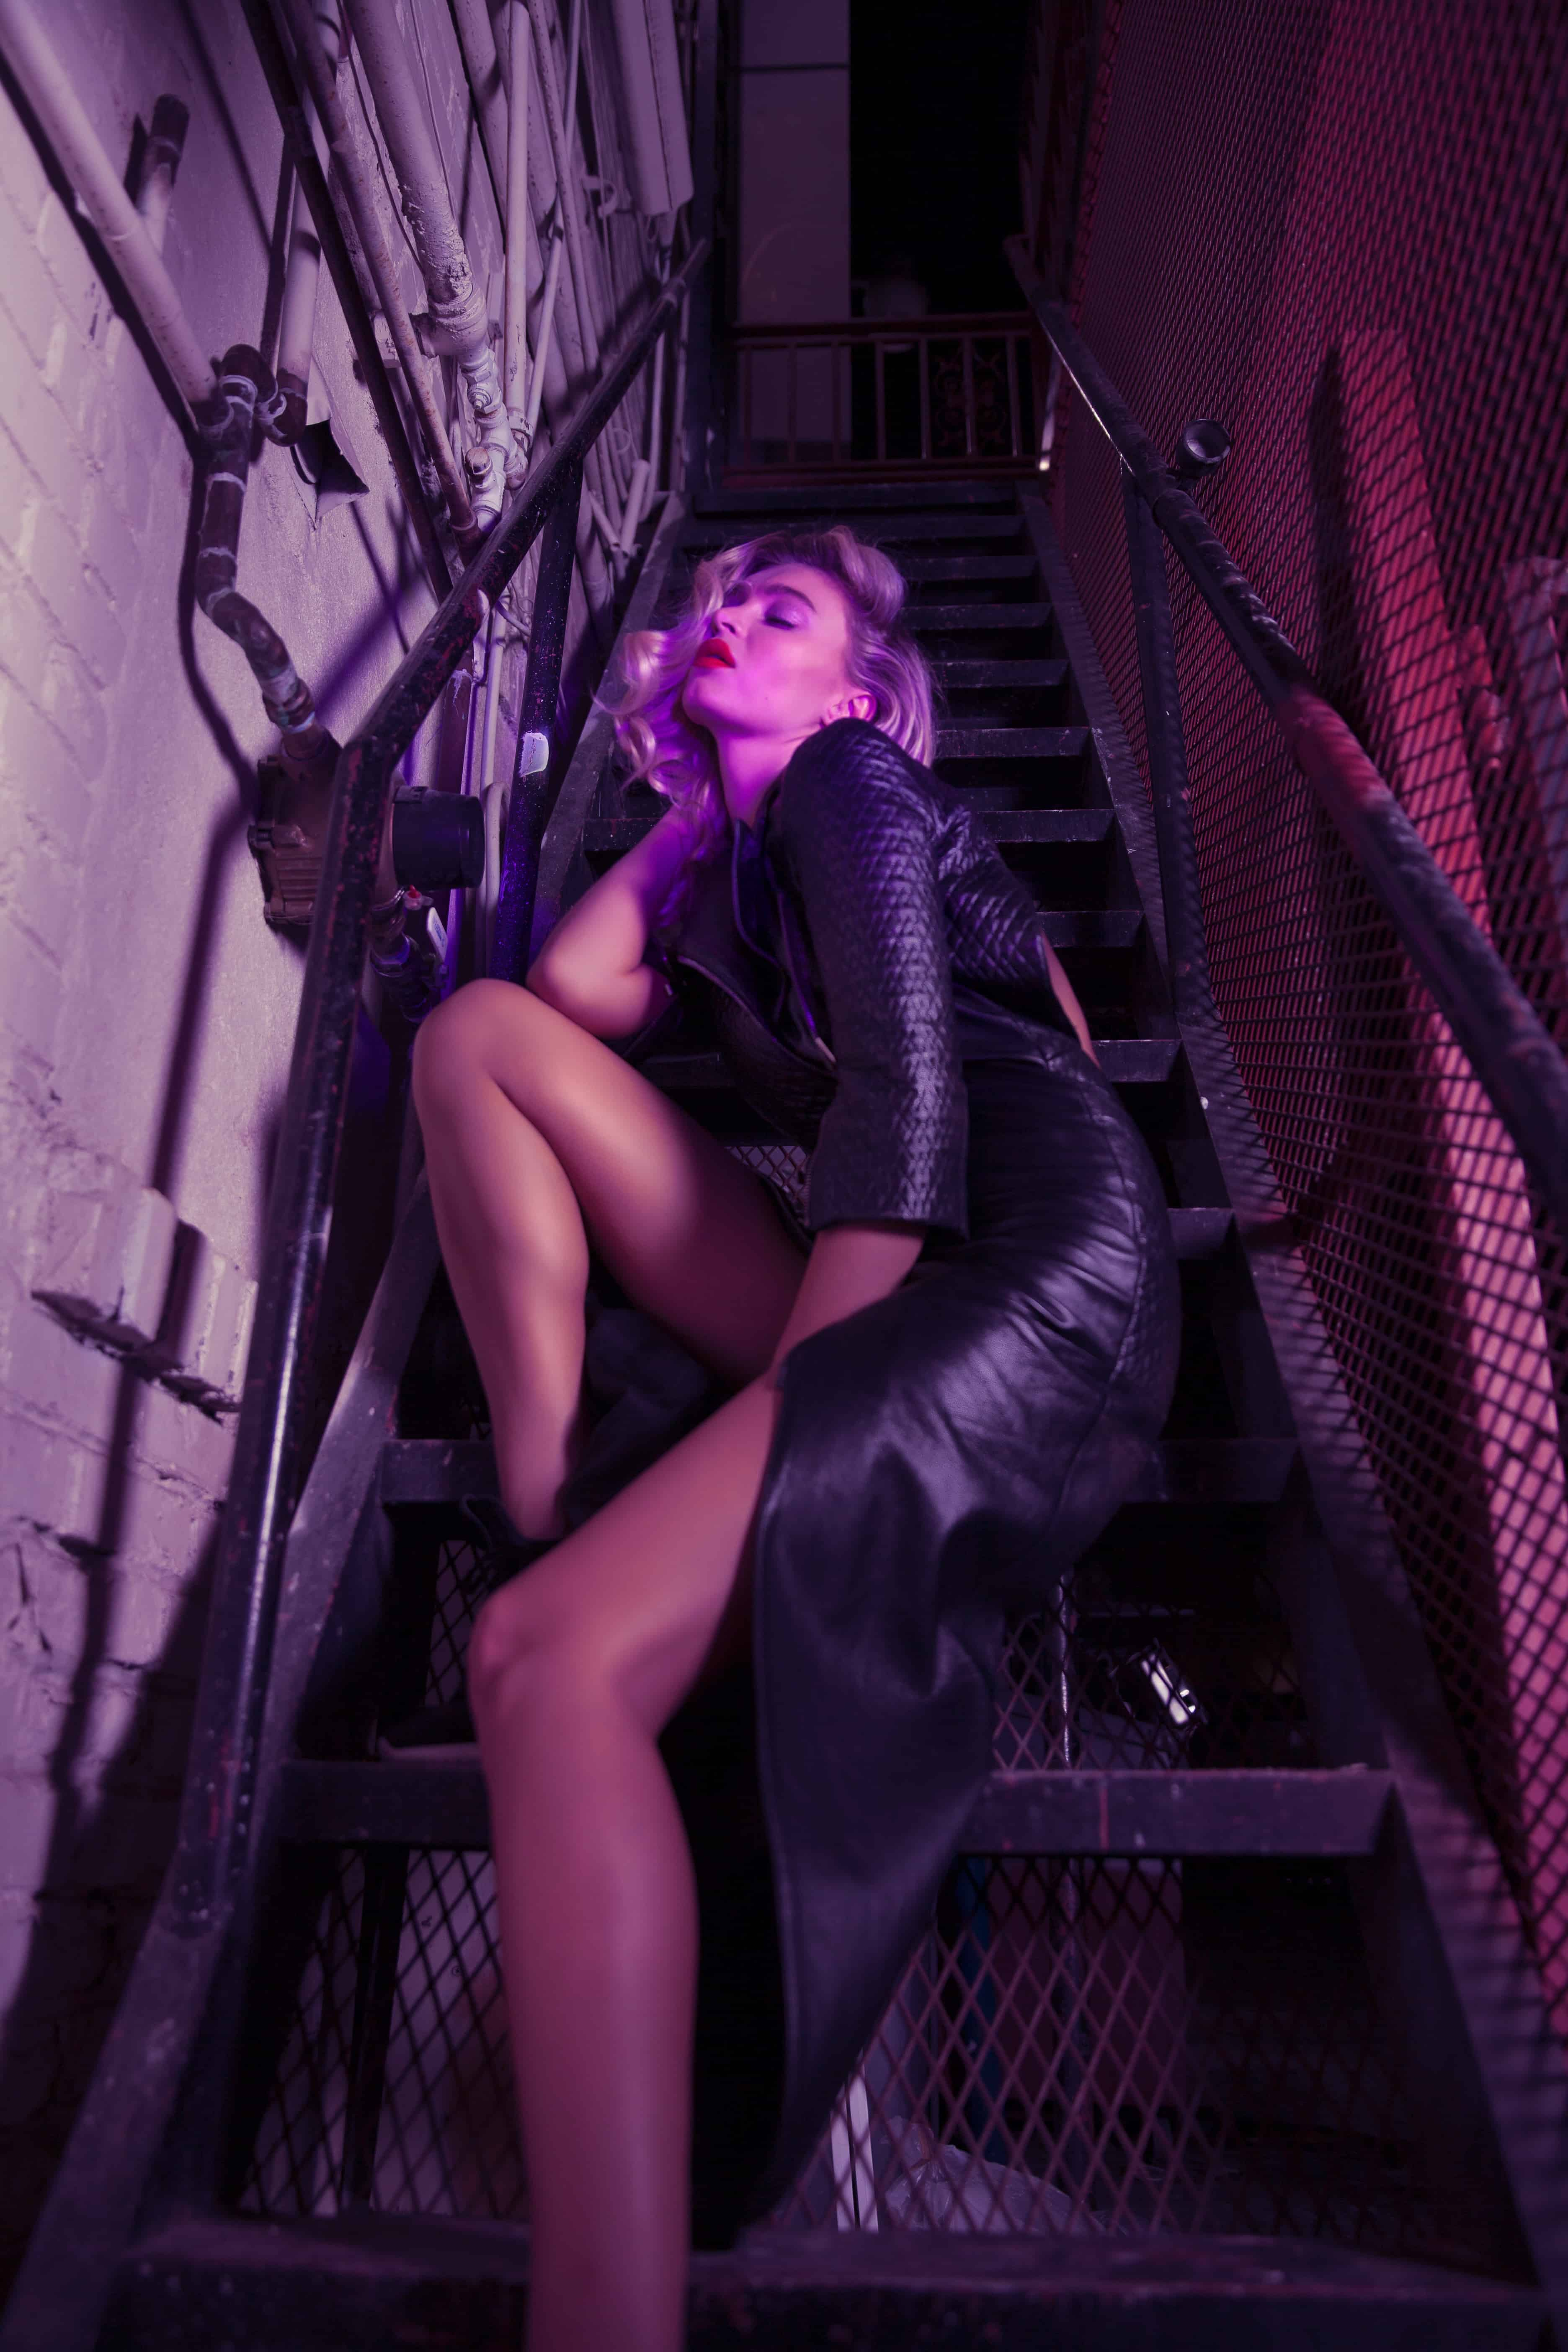 SID_RANE_IVANBITTON_magazine photoshoot in Orange County LA